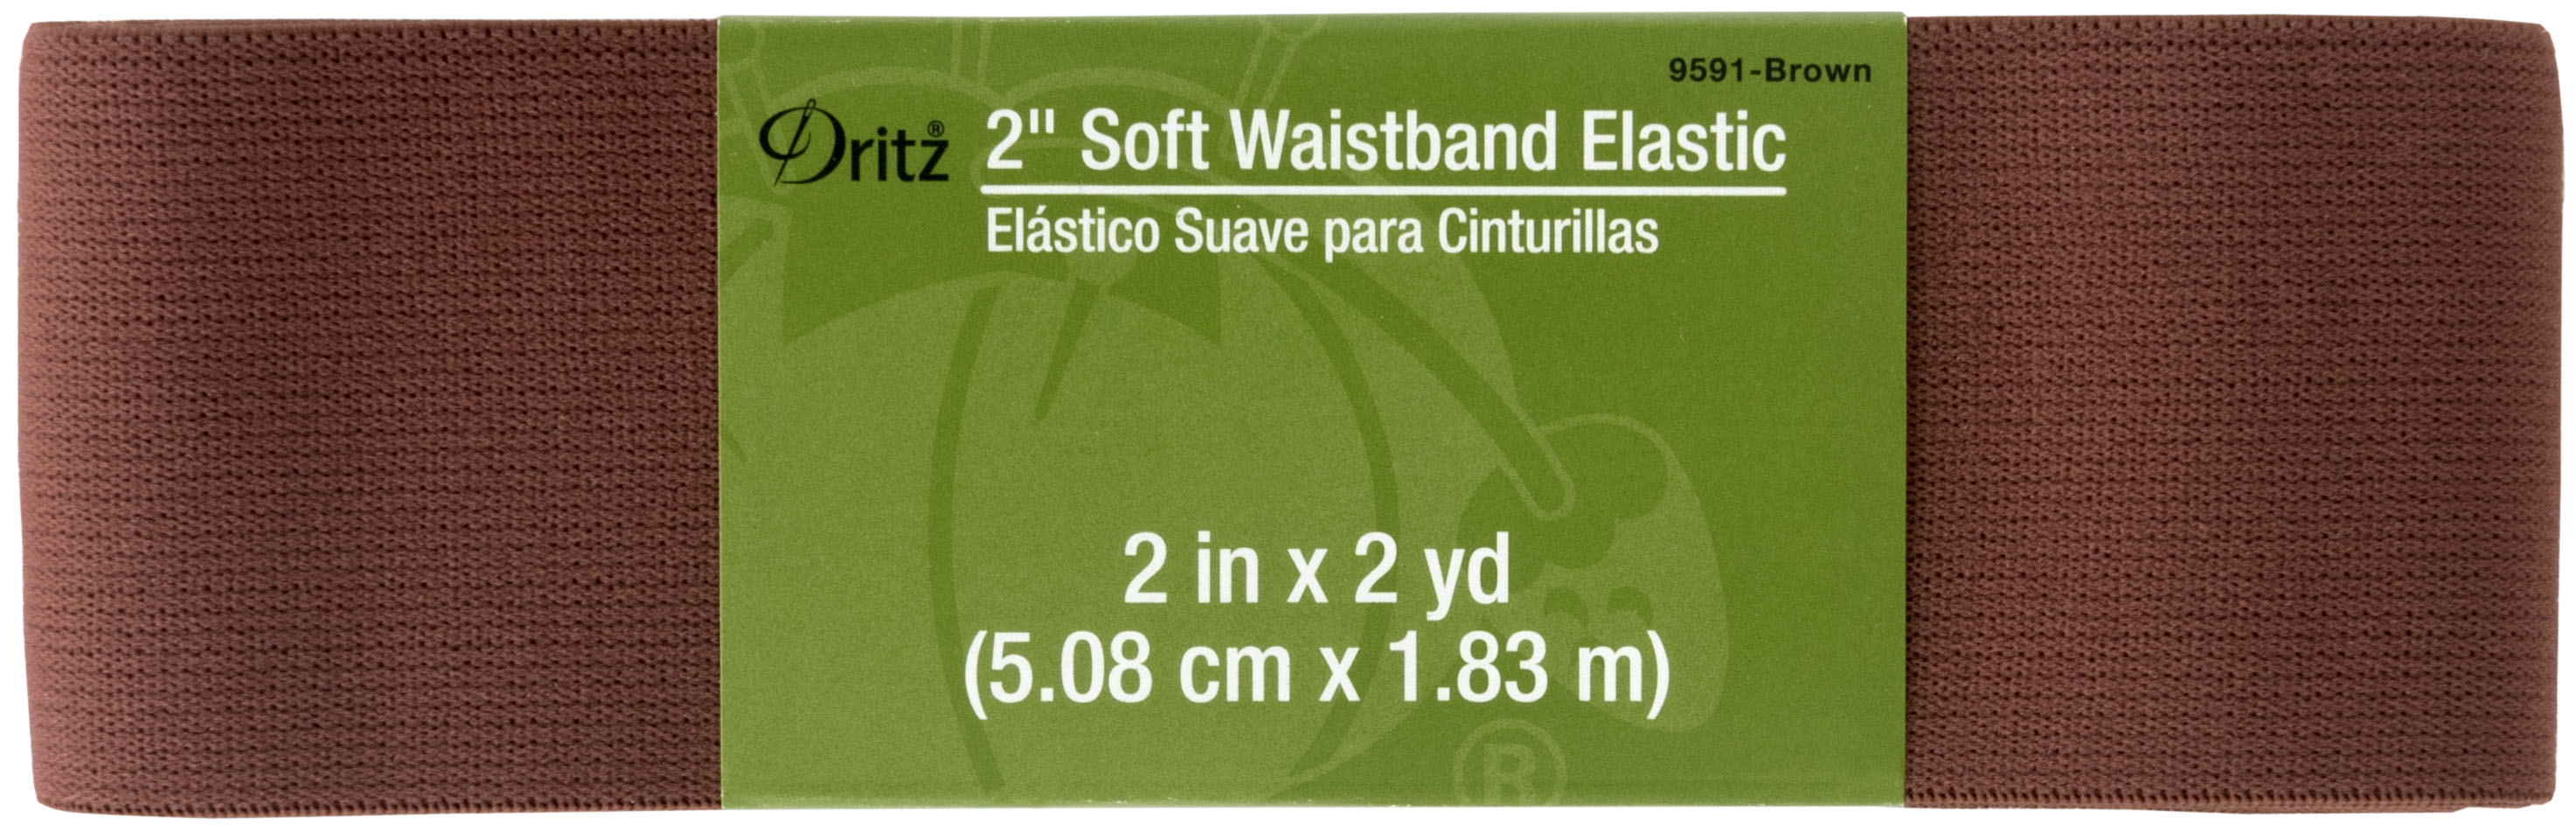 2in x 2yd Soft Waistband Elastic Brown